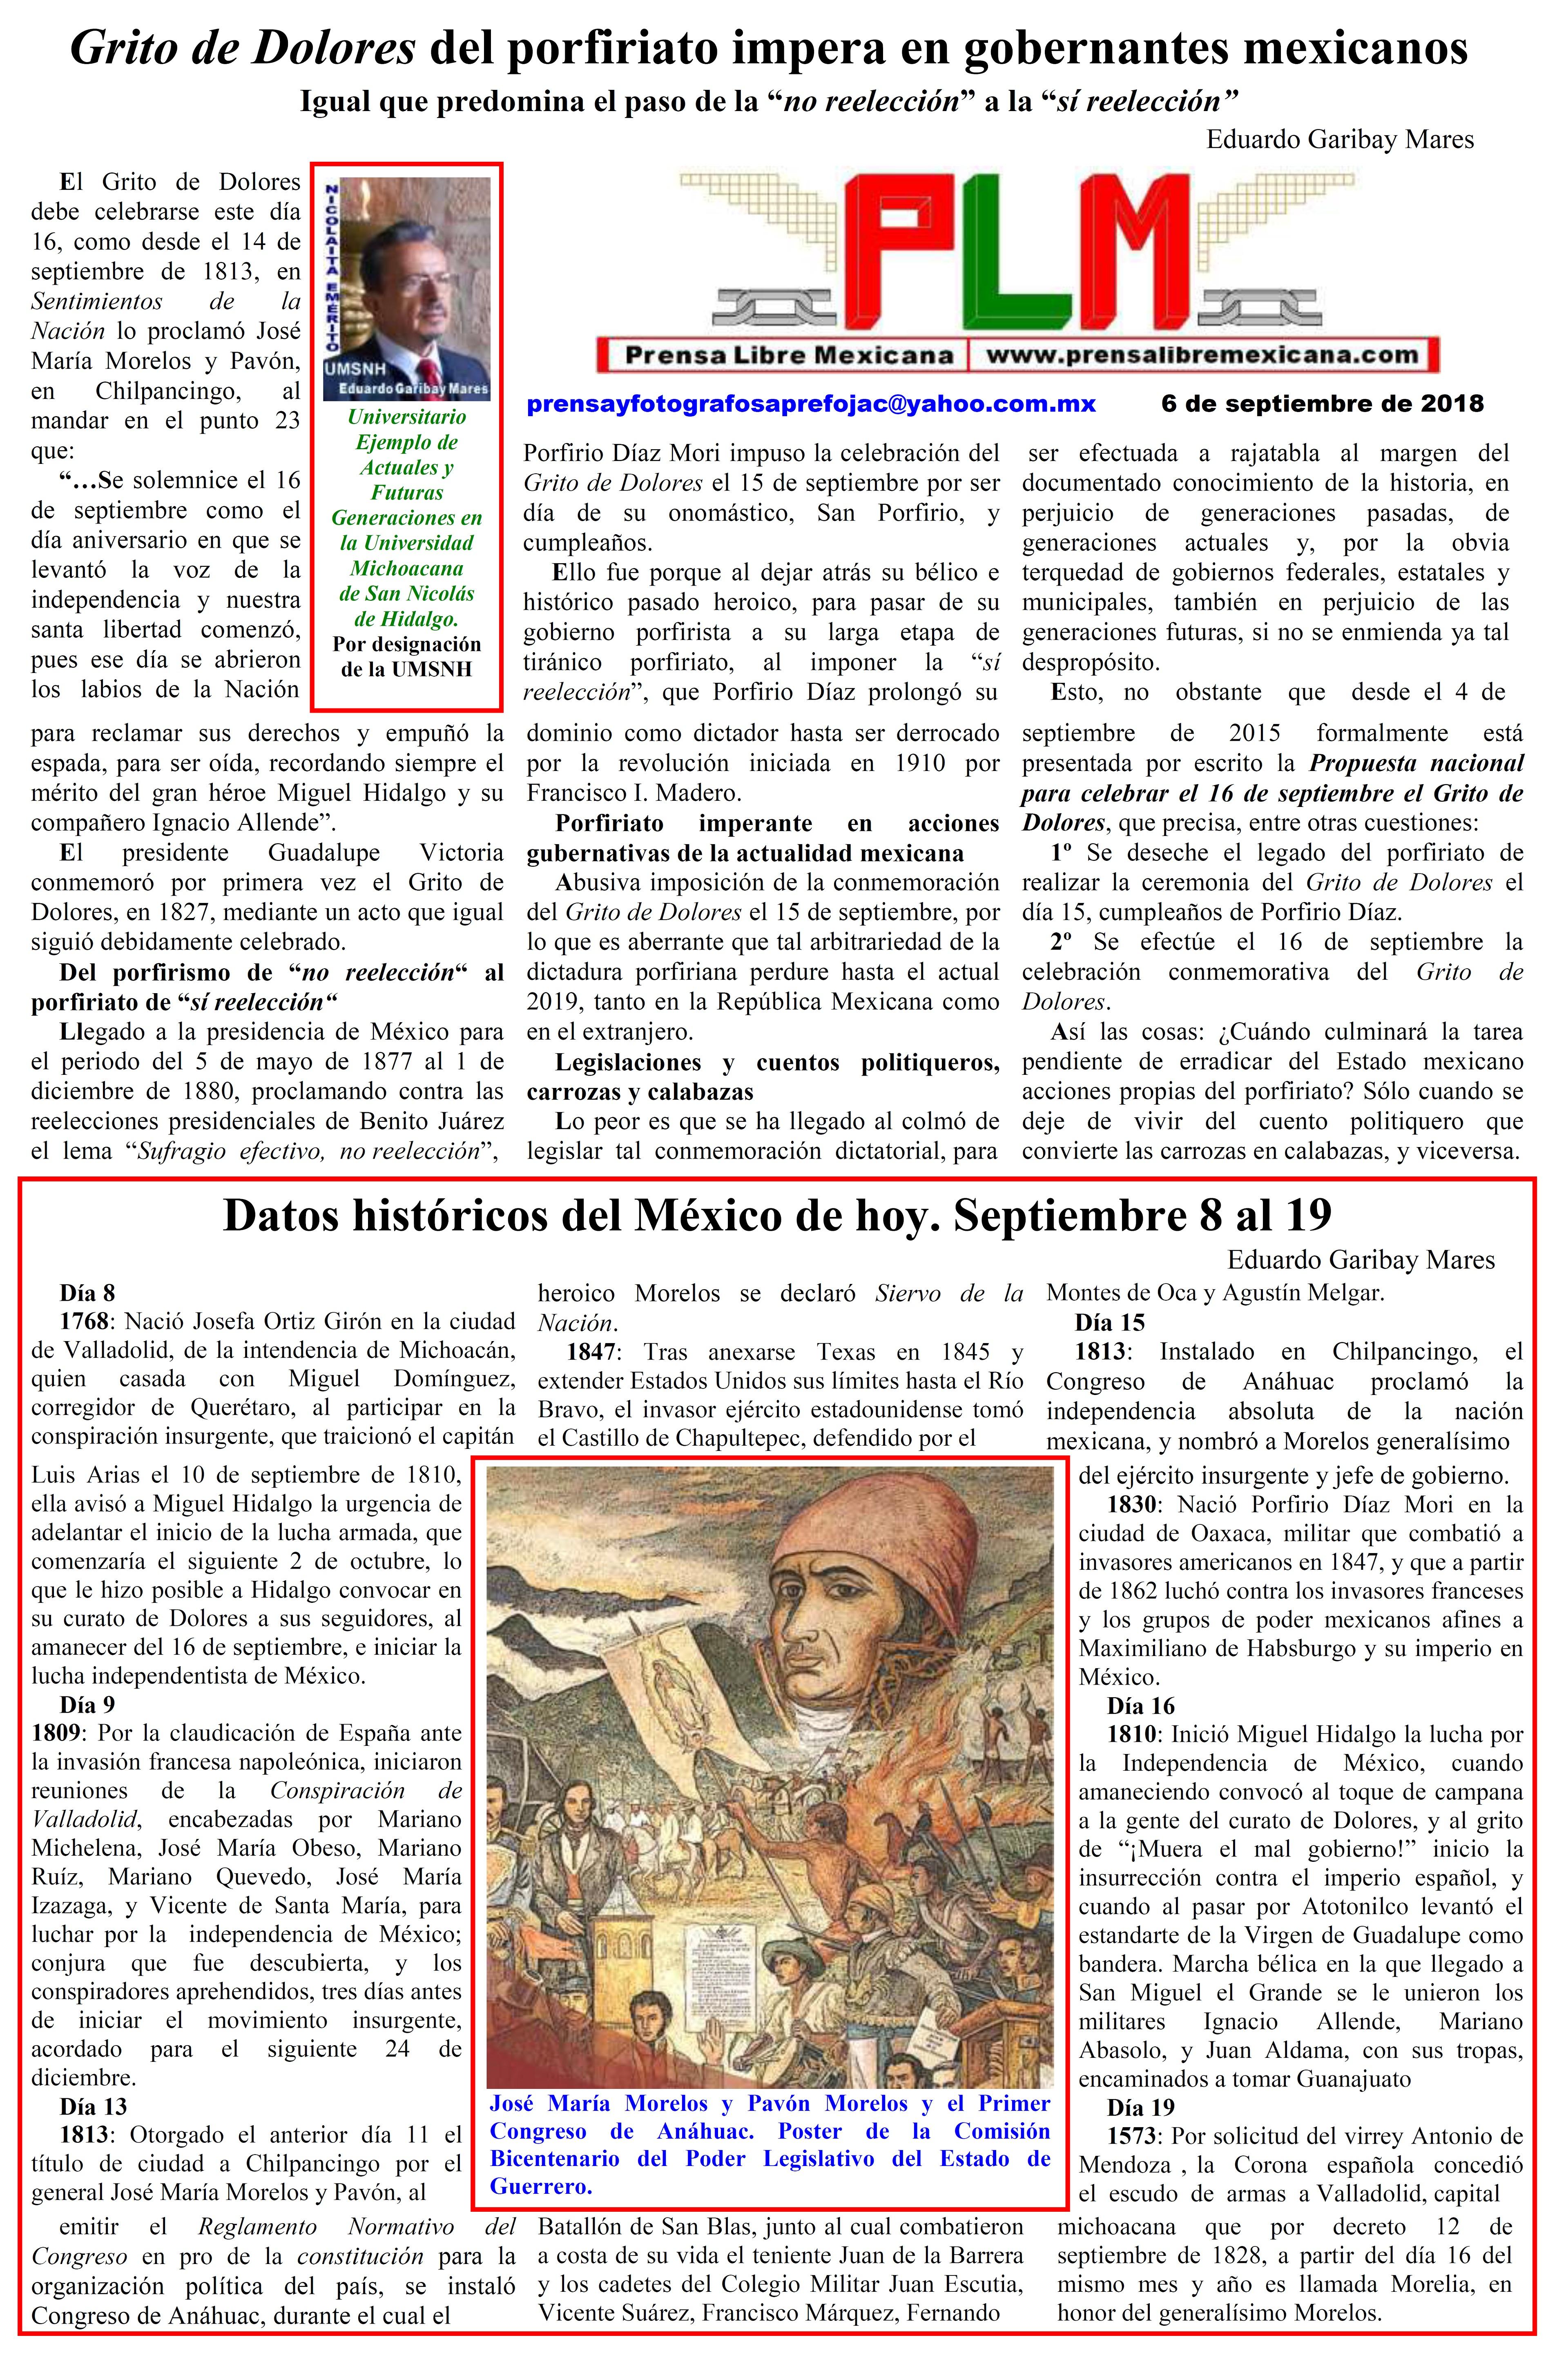 Grito de Dolores del porfiriato impera en gobernantes mexicanos. Eduardo Garibay Mares